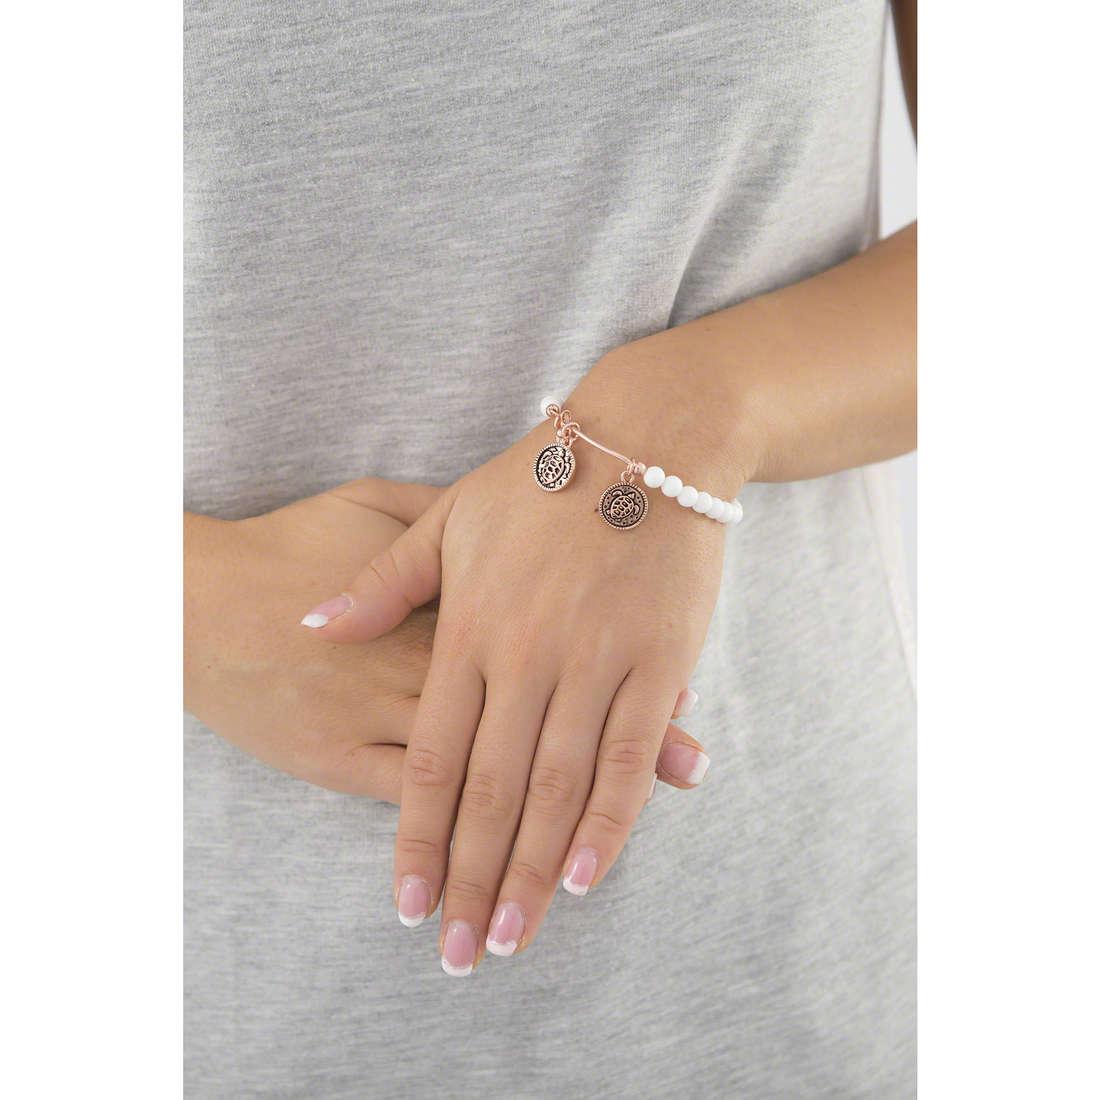 Chrysalis bracciali donna CRBH0111RG indosso